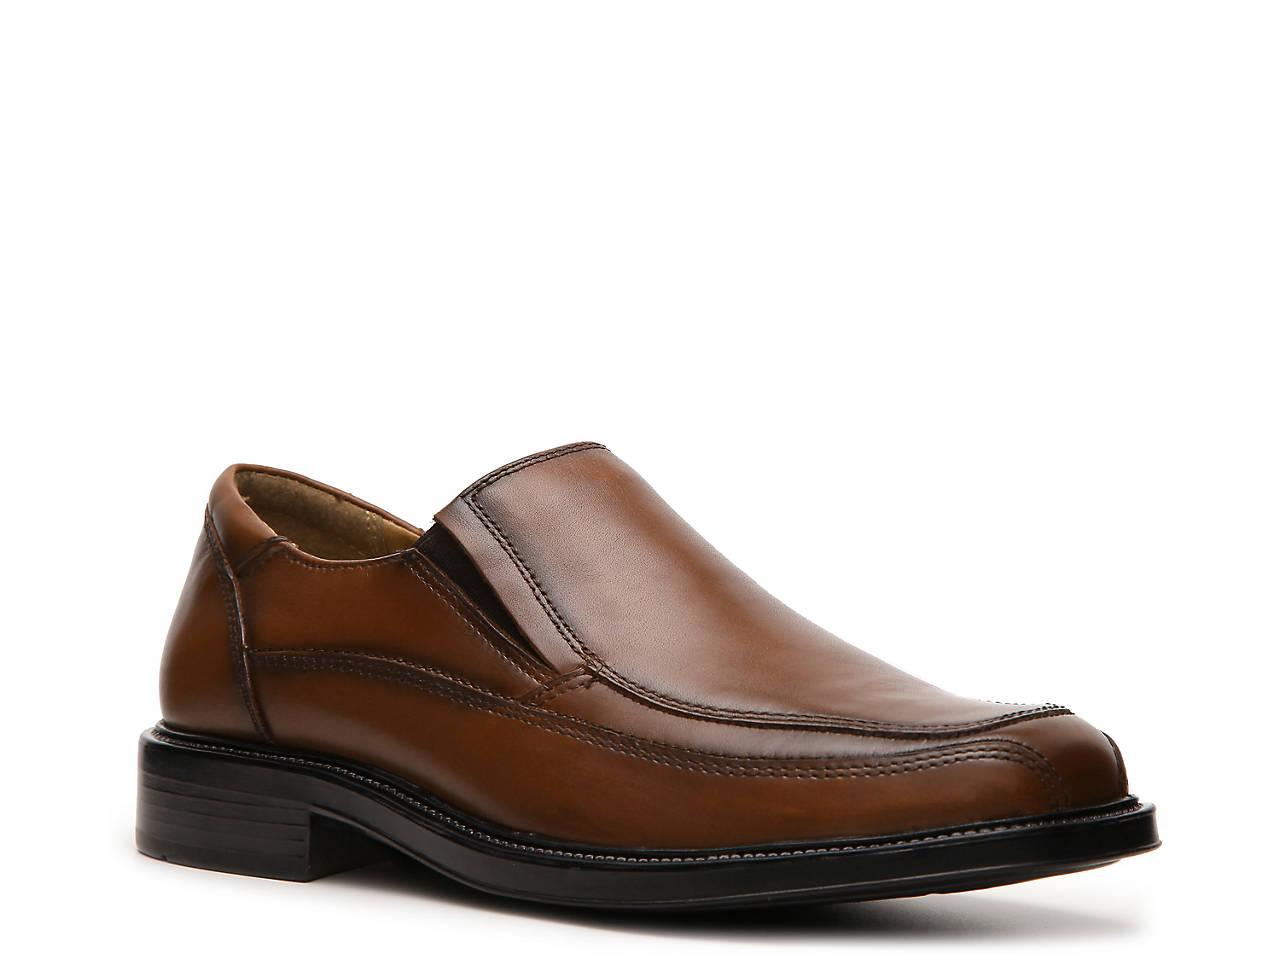 Dockers Proposal Men's Slip-On ... Shoes MrZYv1r